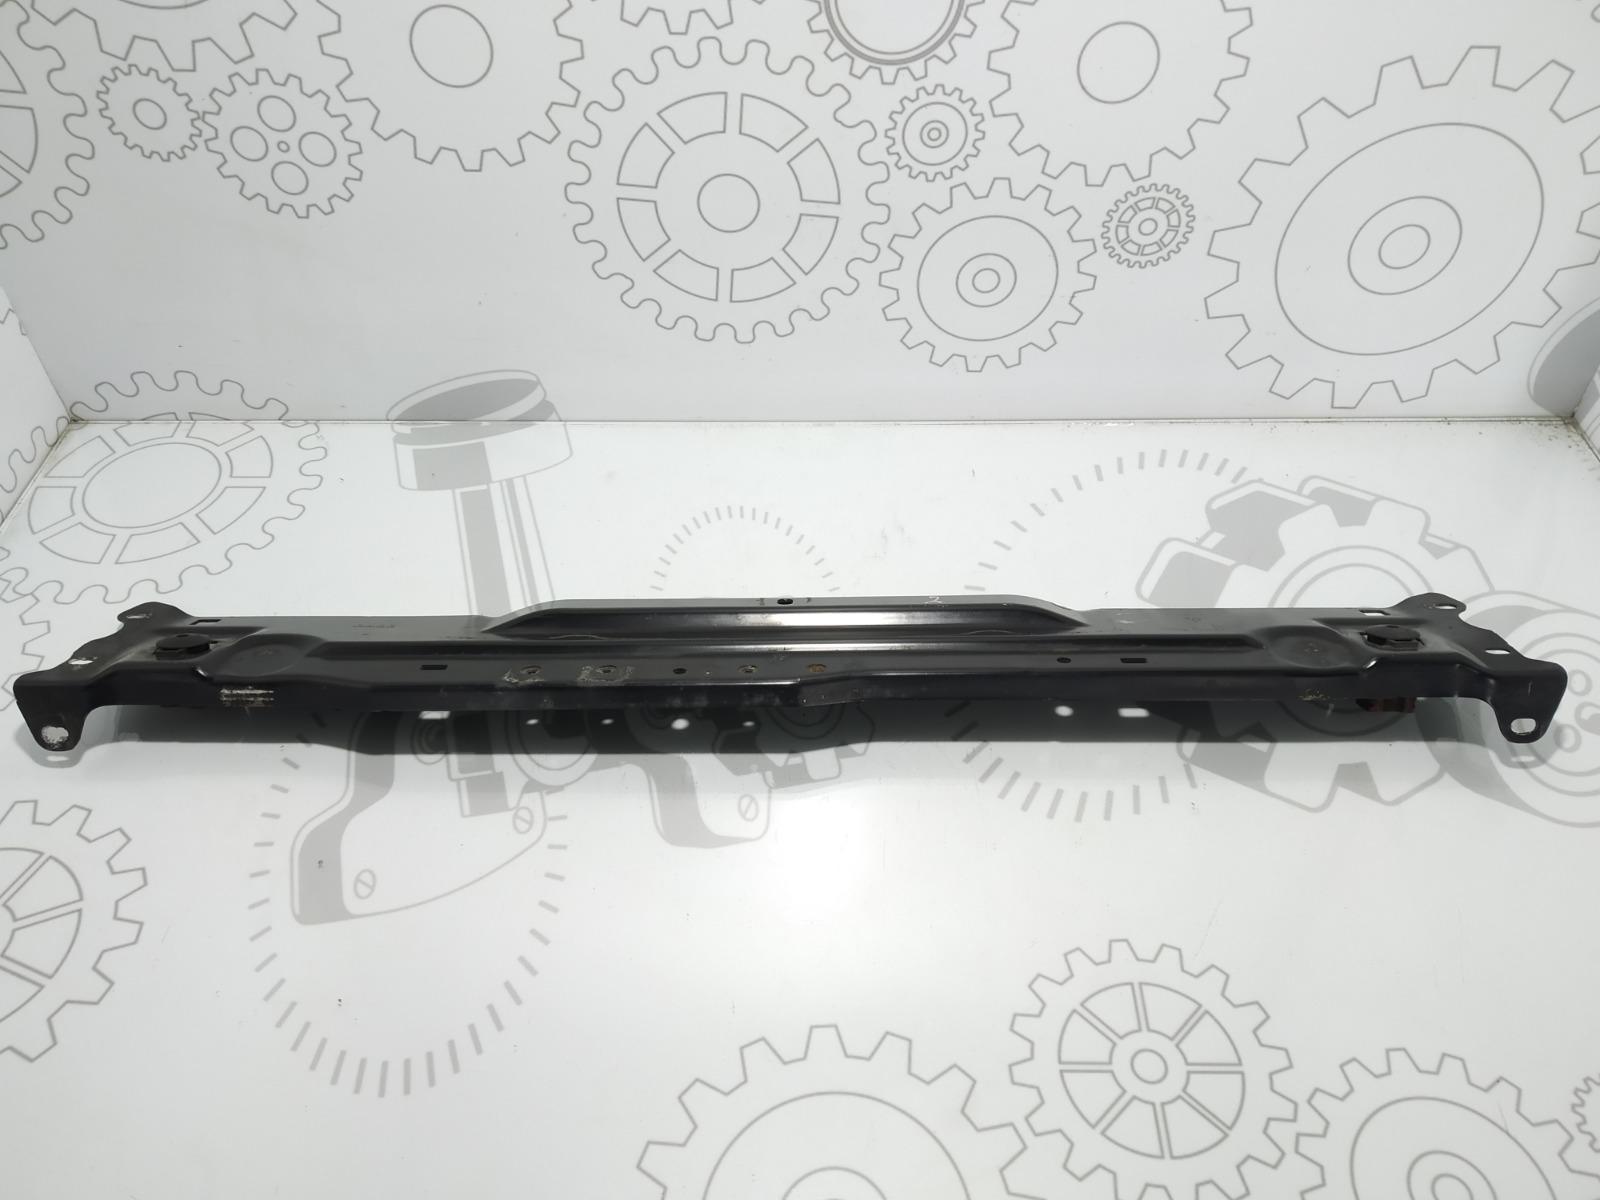 Планка под капот Mercedes C W204 2.2 CDI 2008 (б/у)